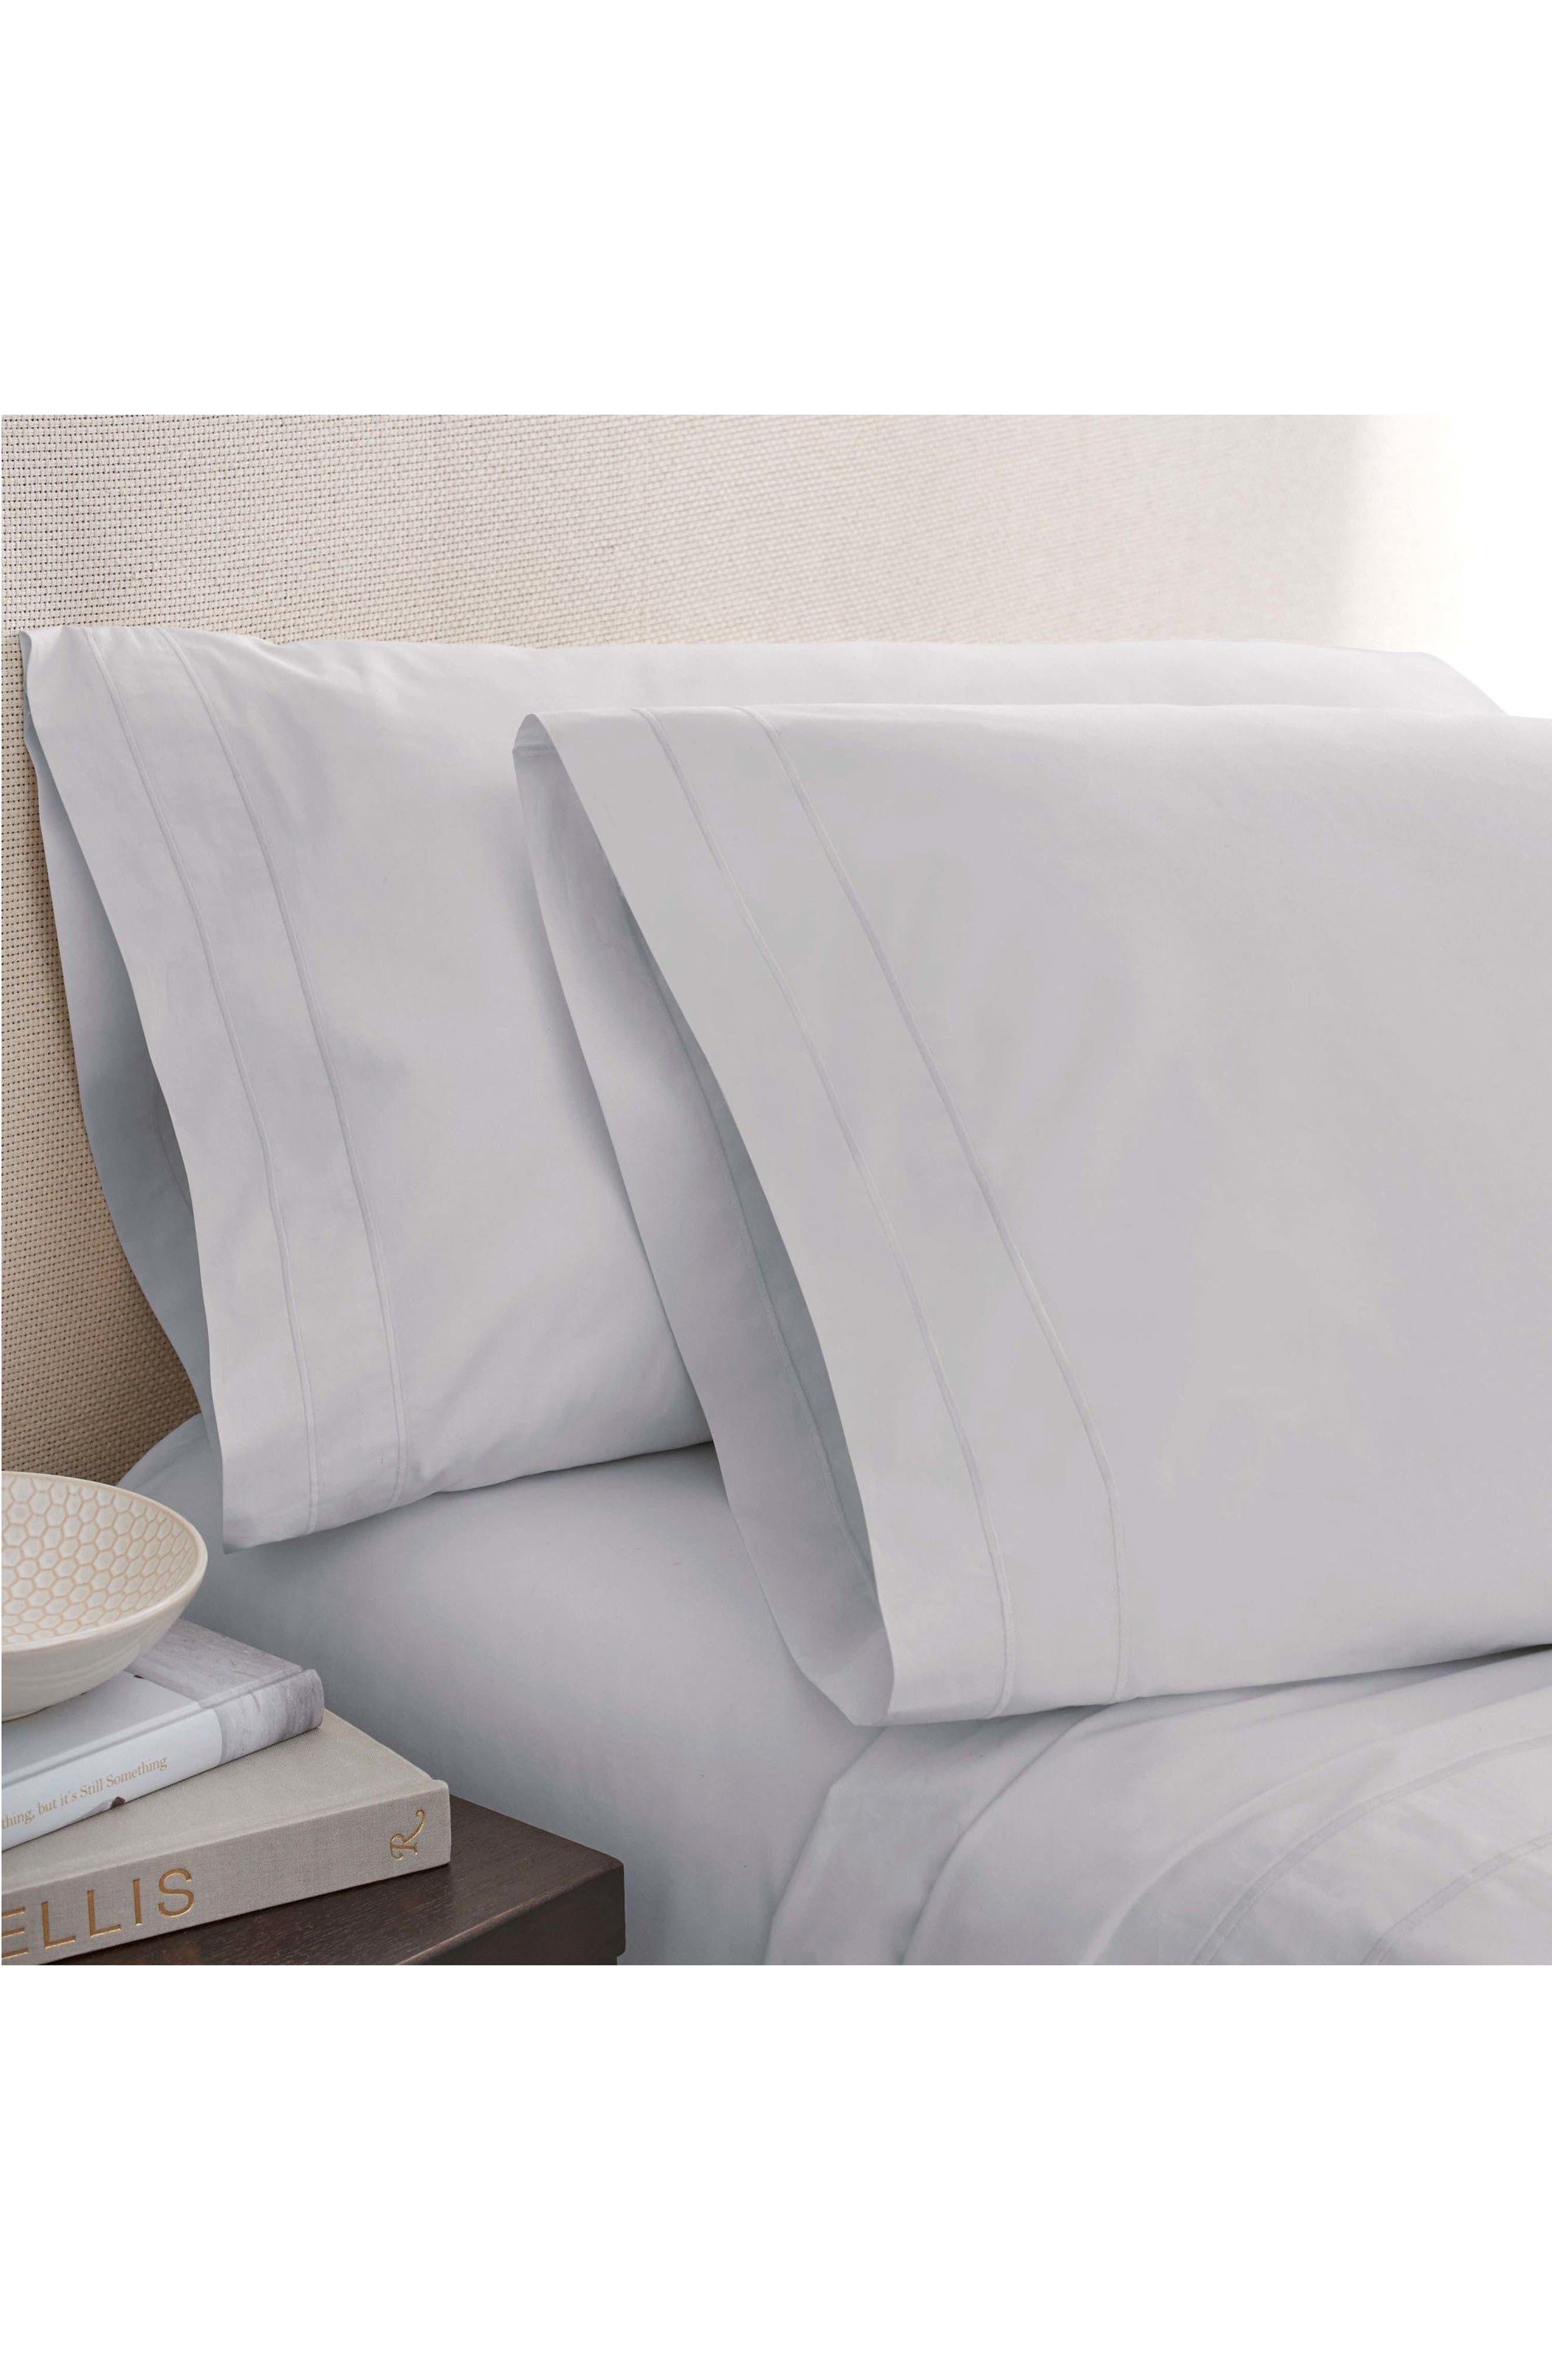 Alternate Image 1 Selected - Portico The Denizen Organic Cotton Pillowcases